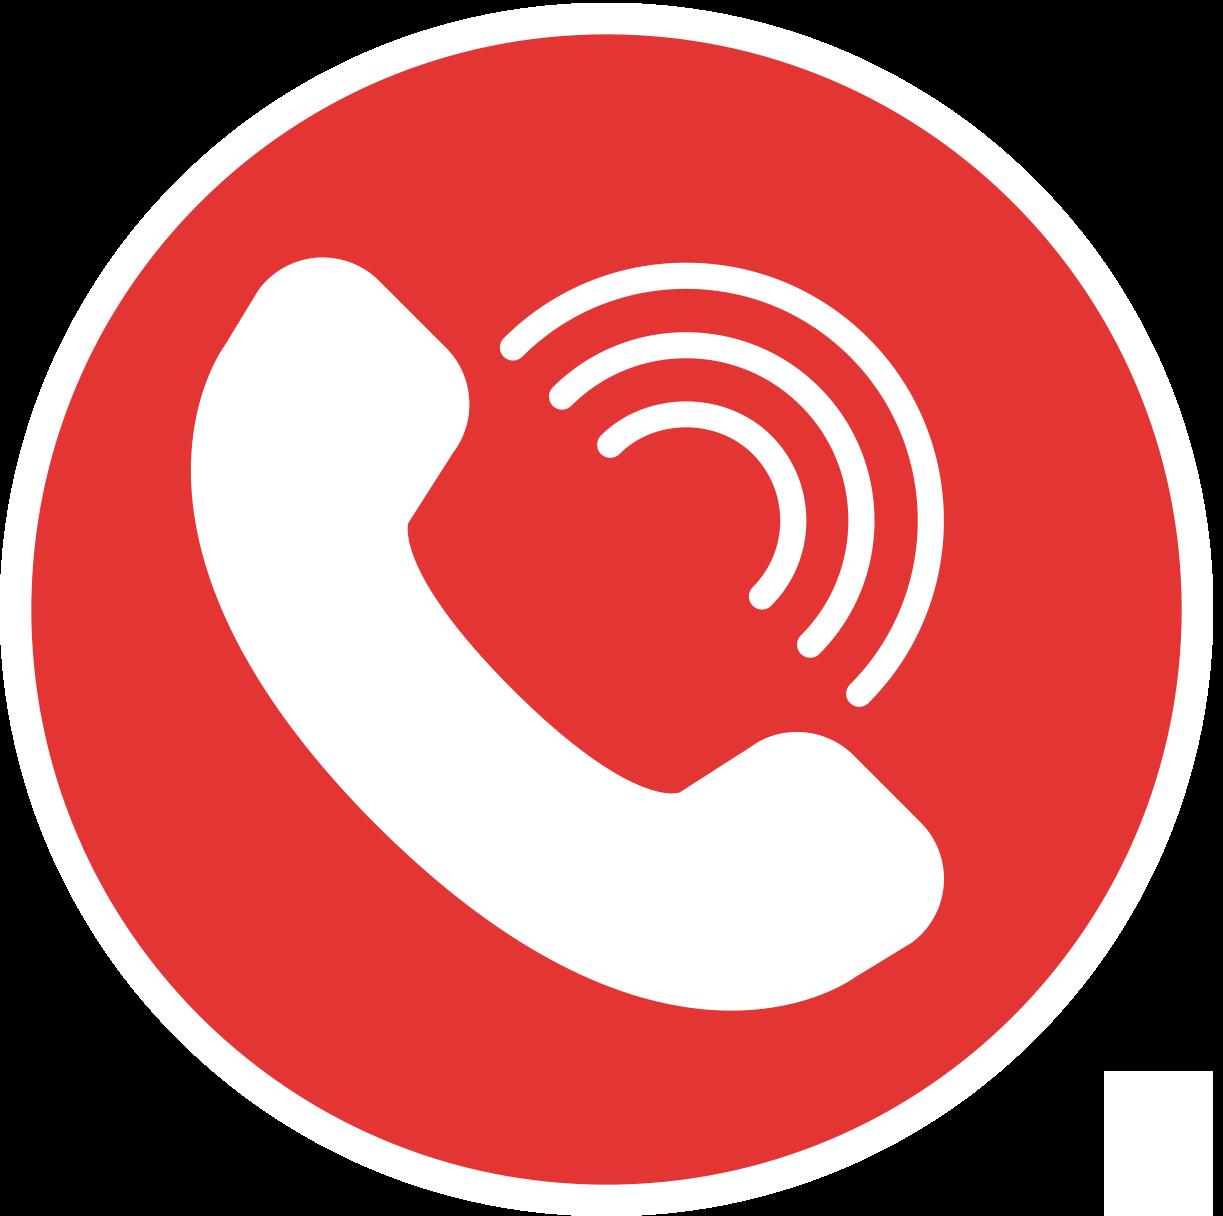 TelefonoIco